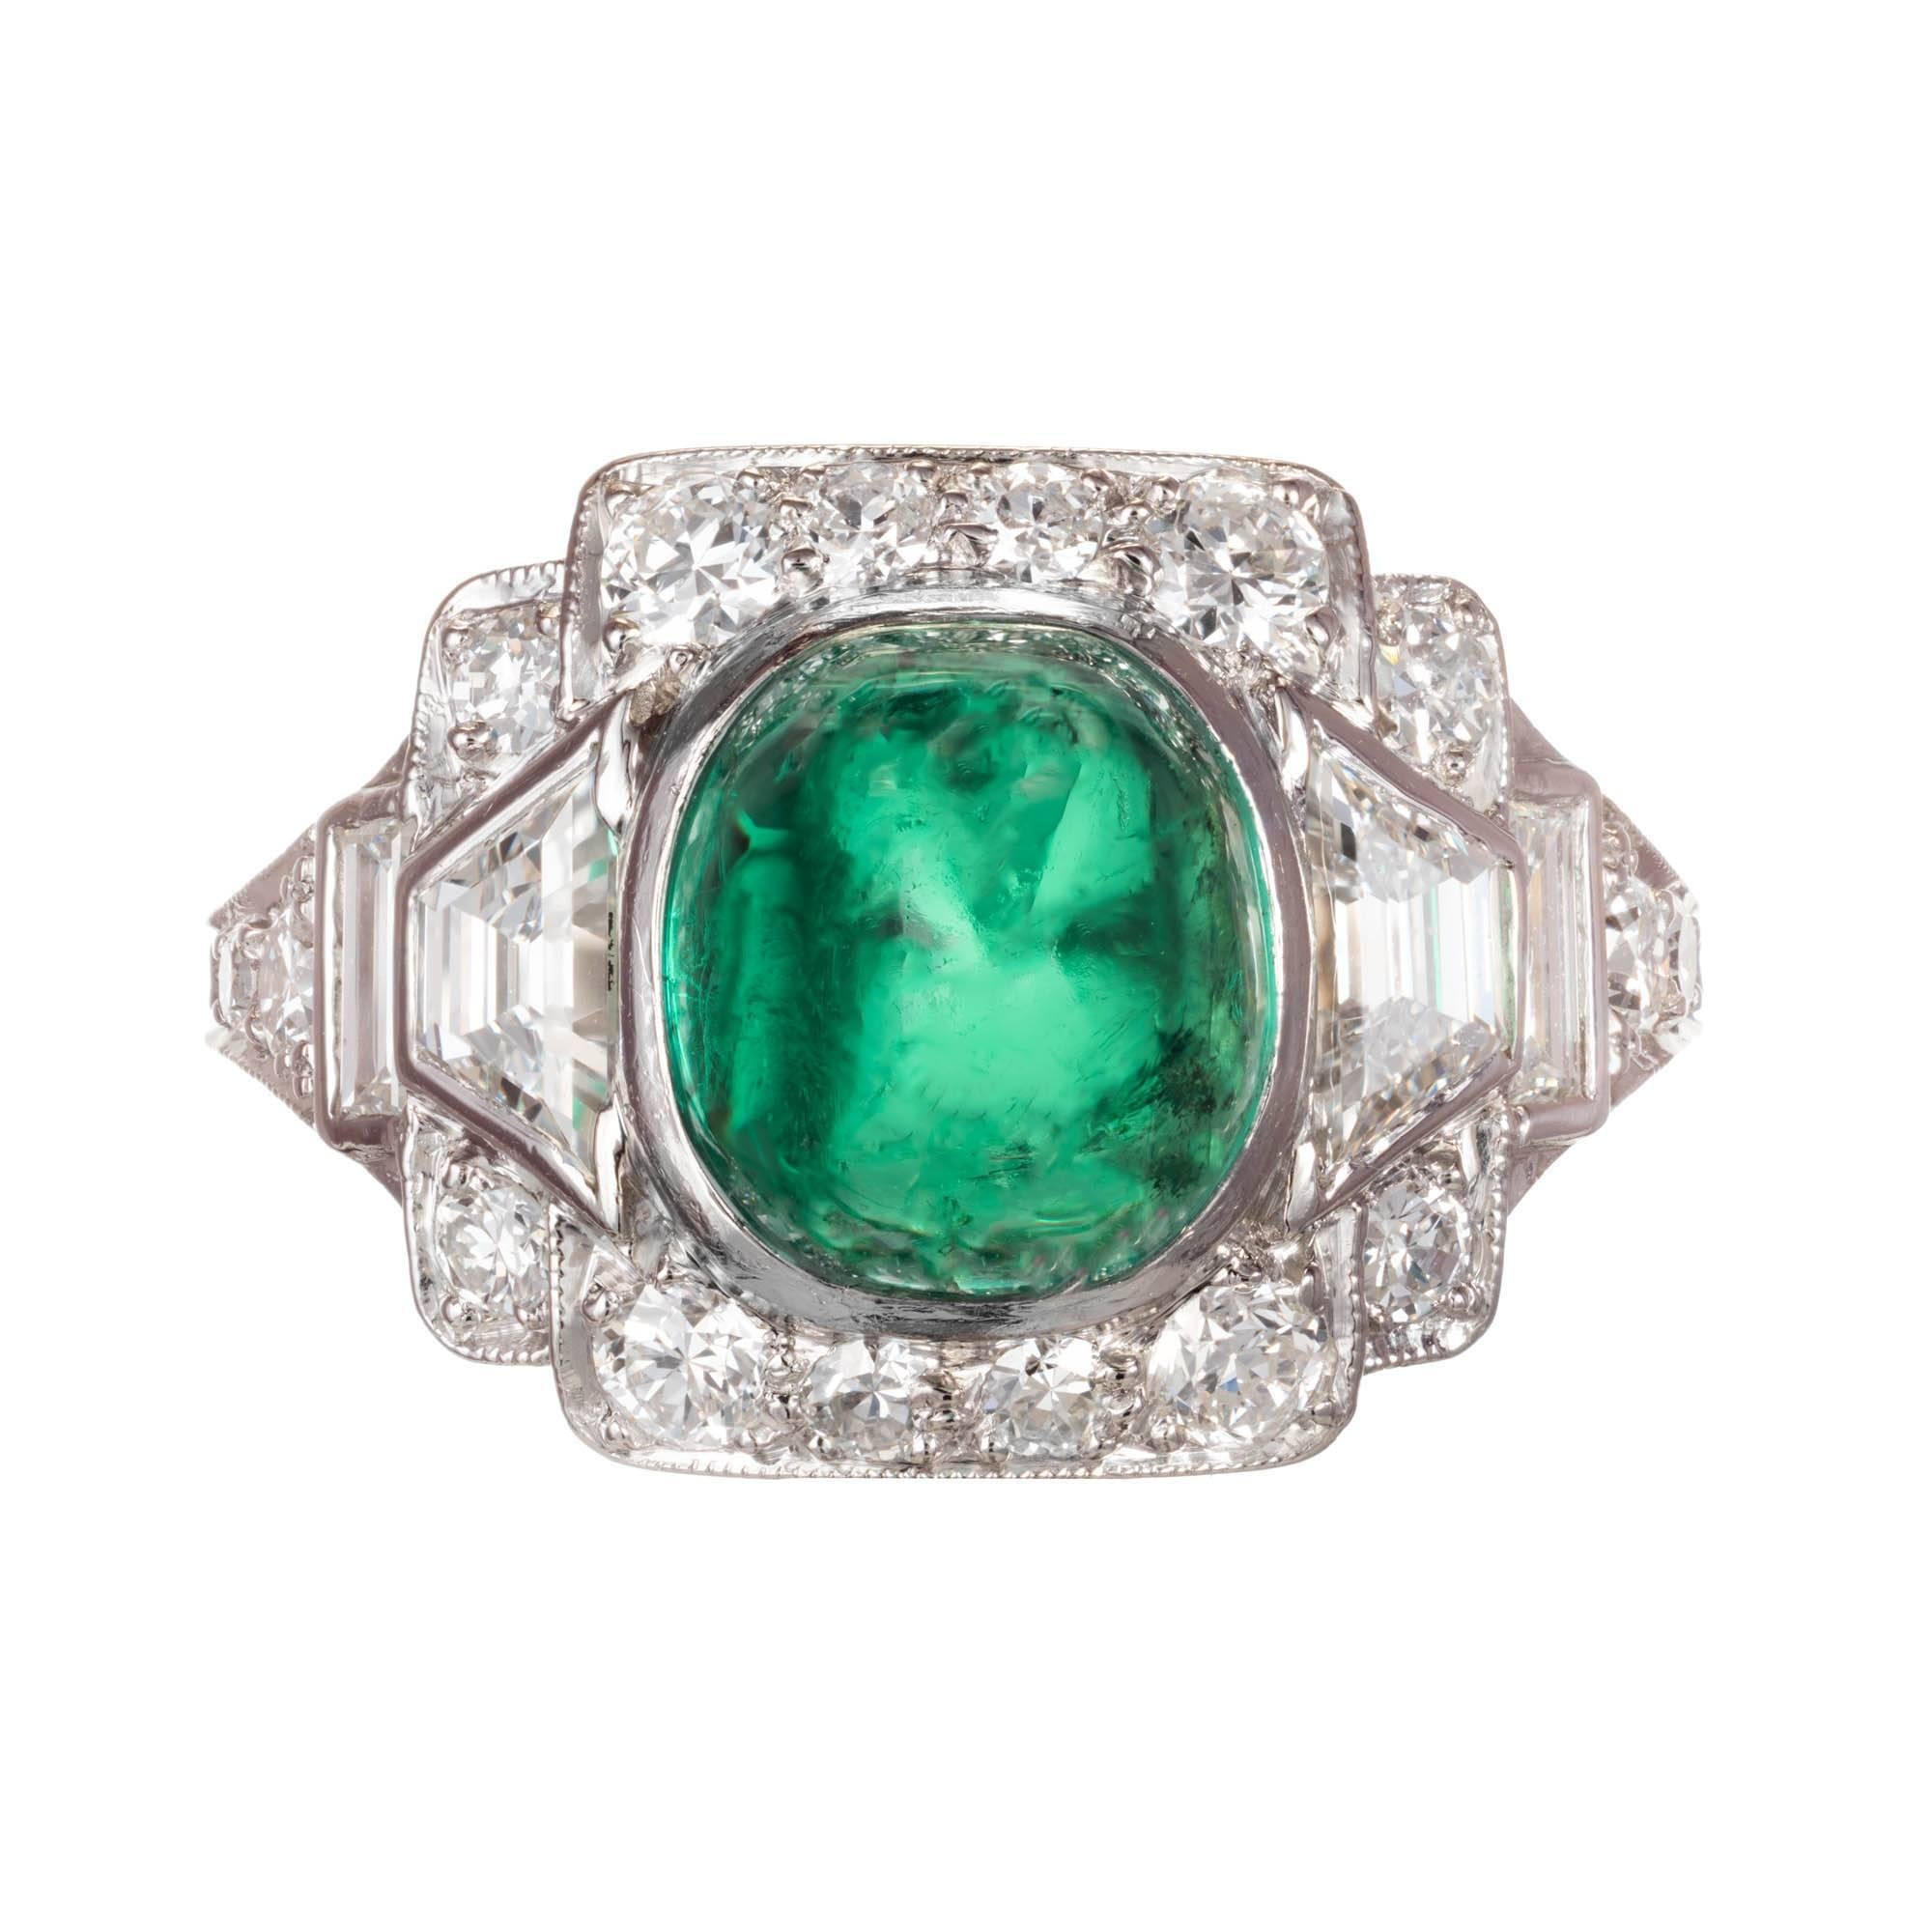 Tiffany & Co. 3.60 Carat Colombian Emerald Diamond Platinum Cocktail Ring